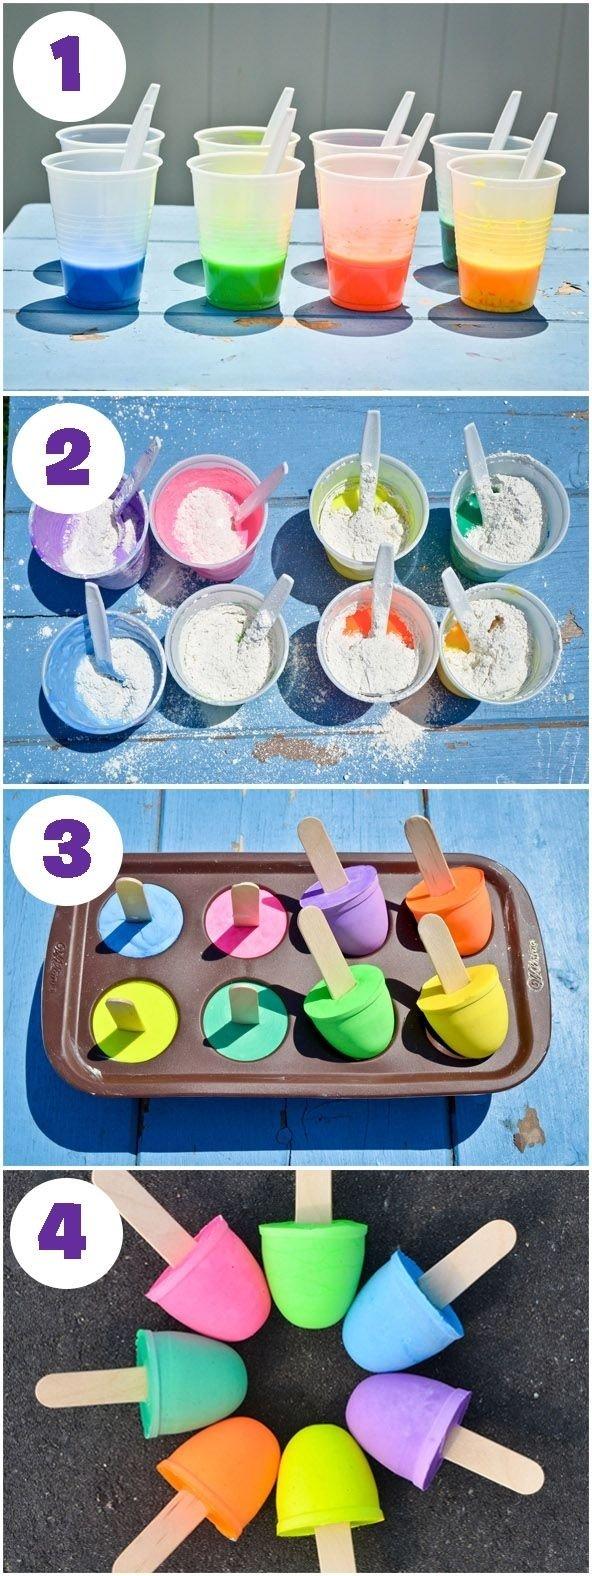 10 Best Craft Ideas For Kids Pinterest 85 best diy ideas for kids images on pinterest for kids kids 2020